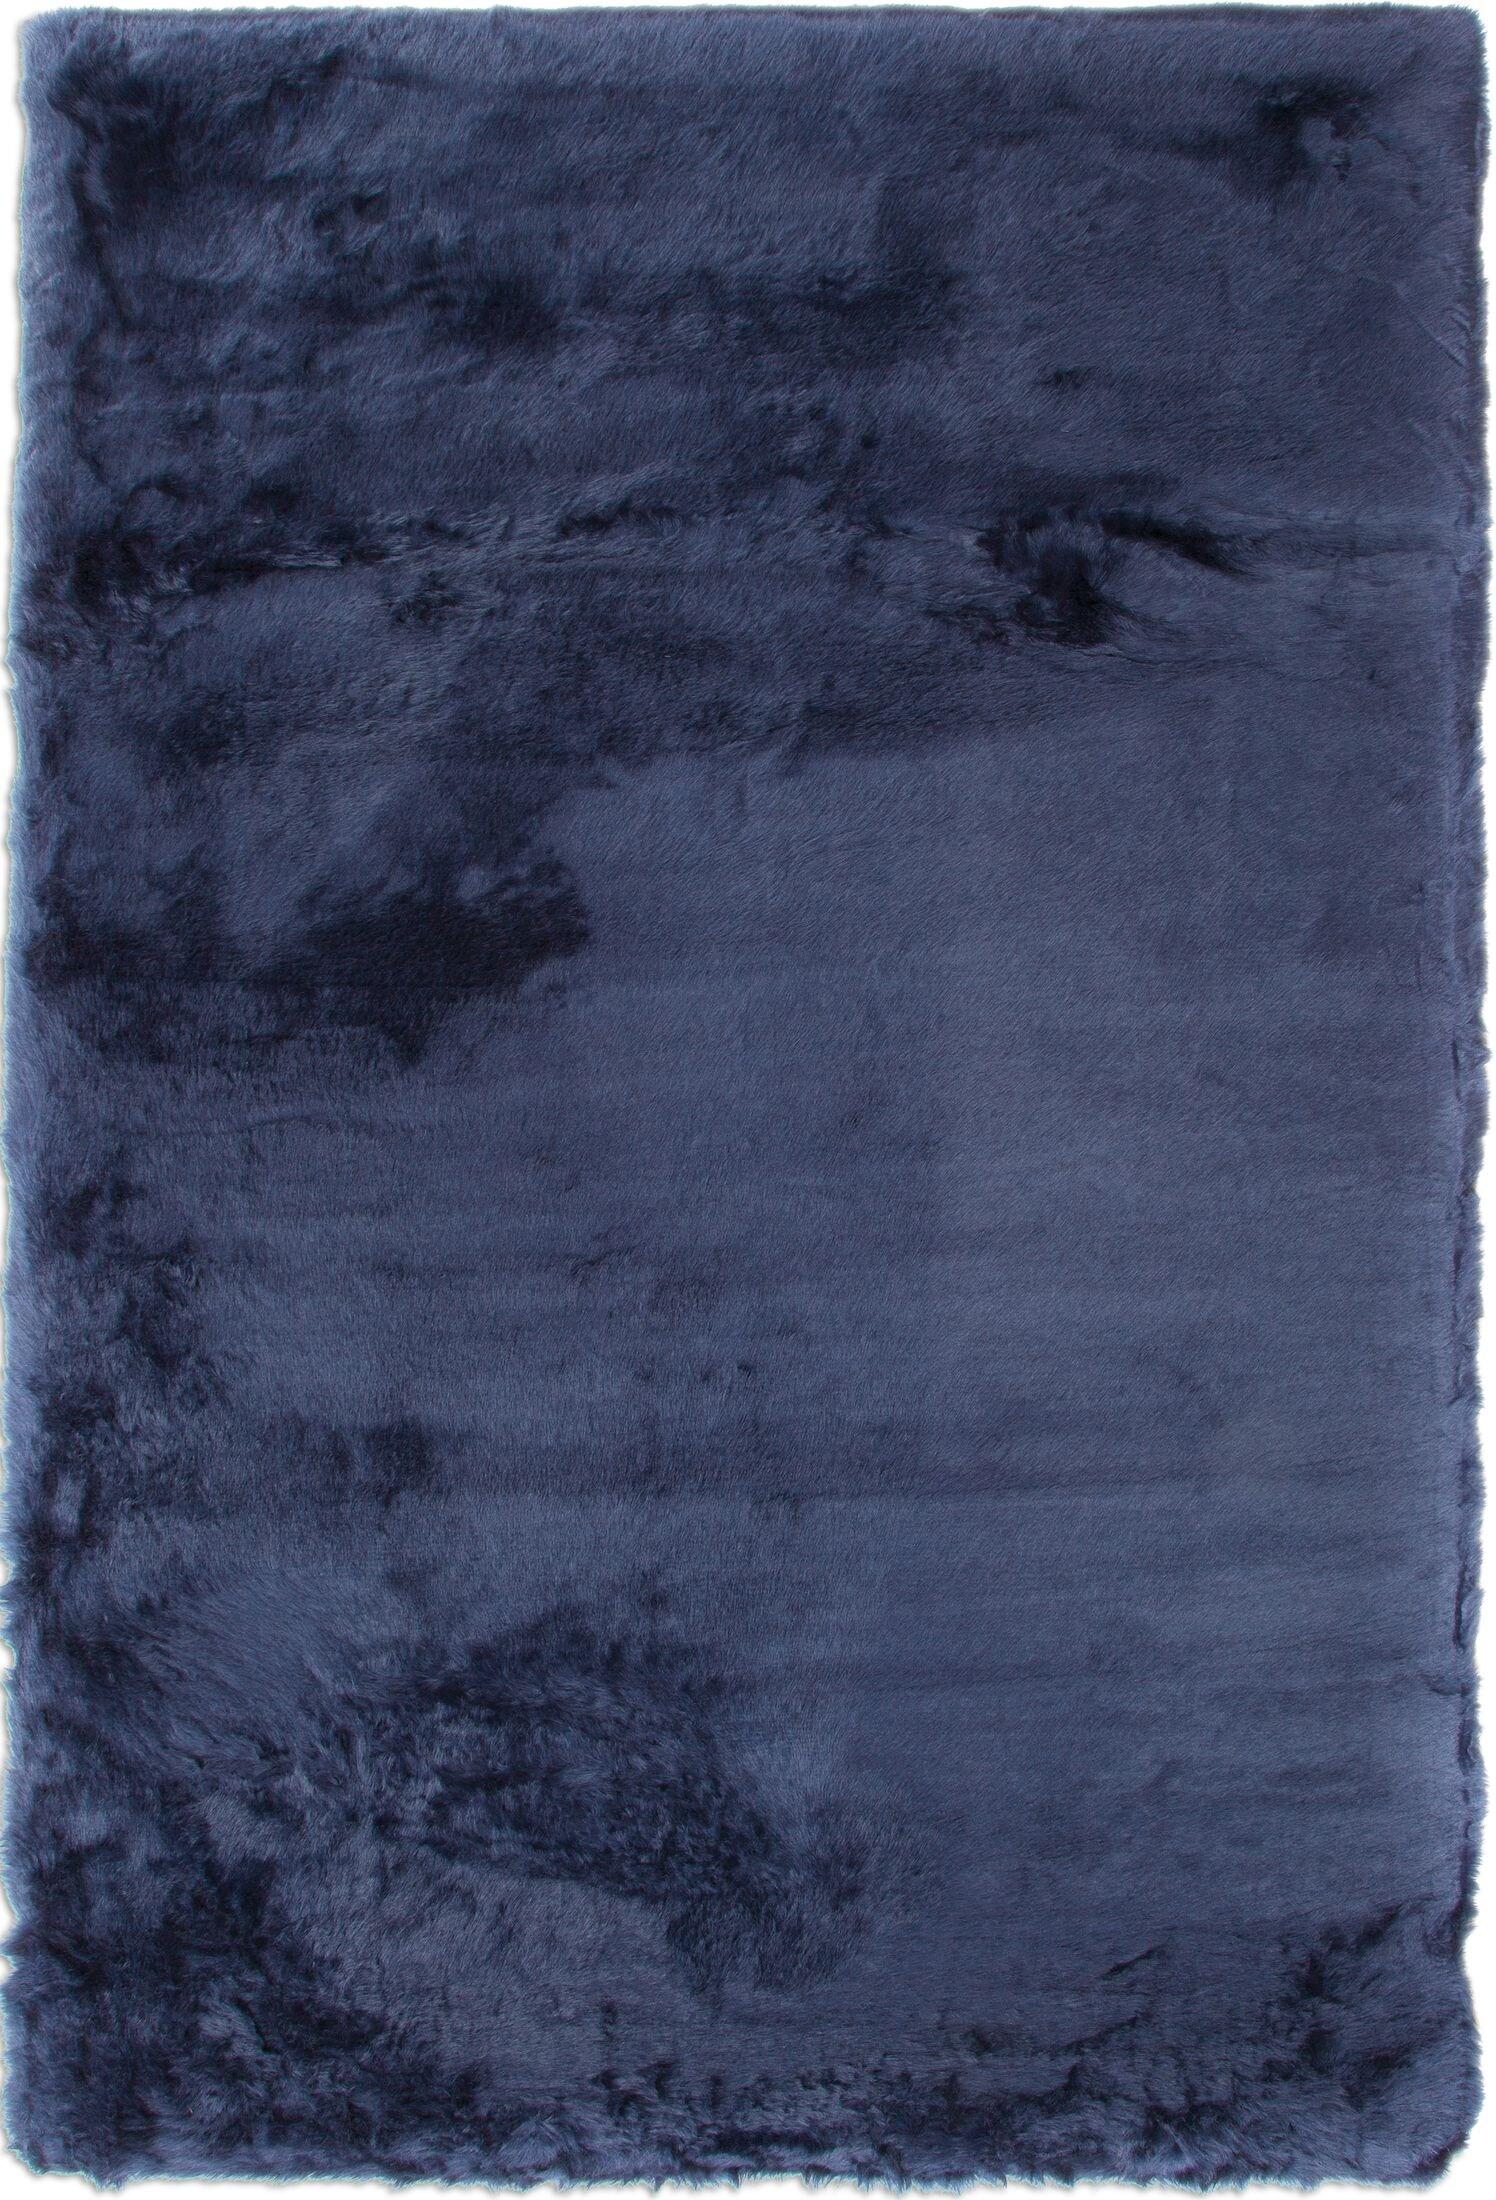 Rugs - Faux Mink Fur Area Rug - Sapphire